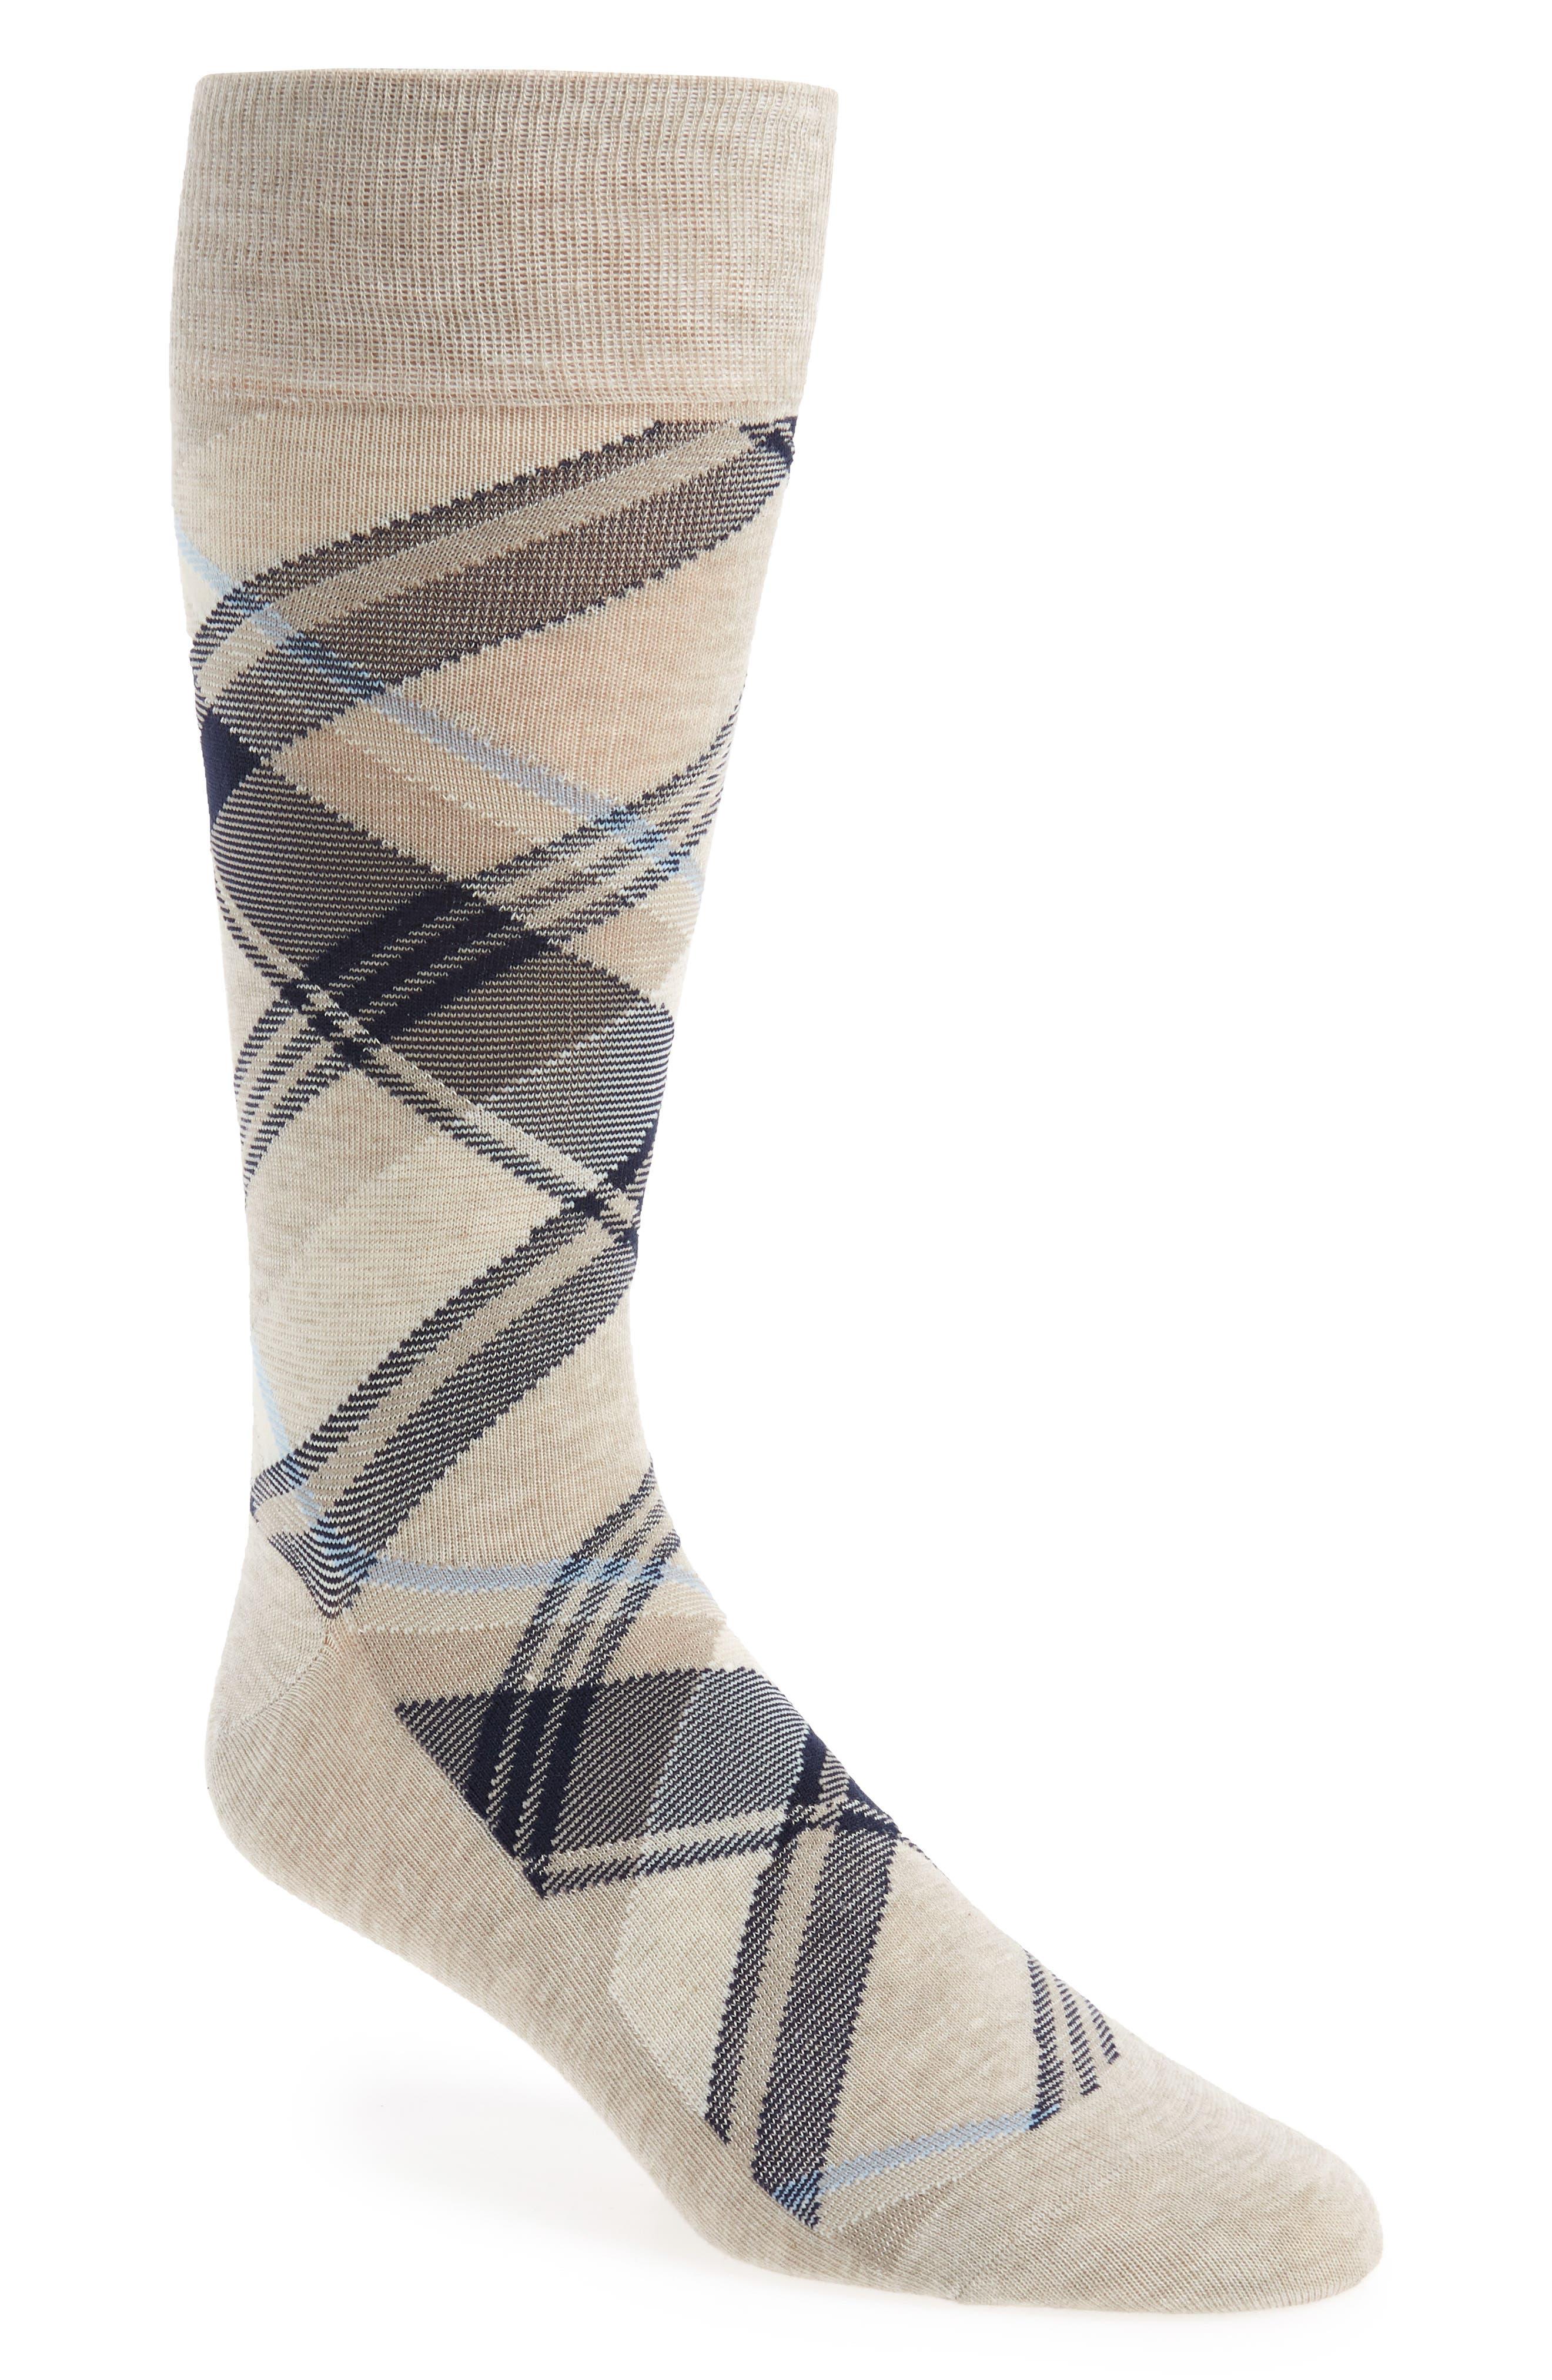 Plaid Socks,                         Main,                         color, OATMEAL HEATHER